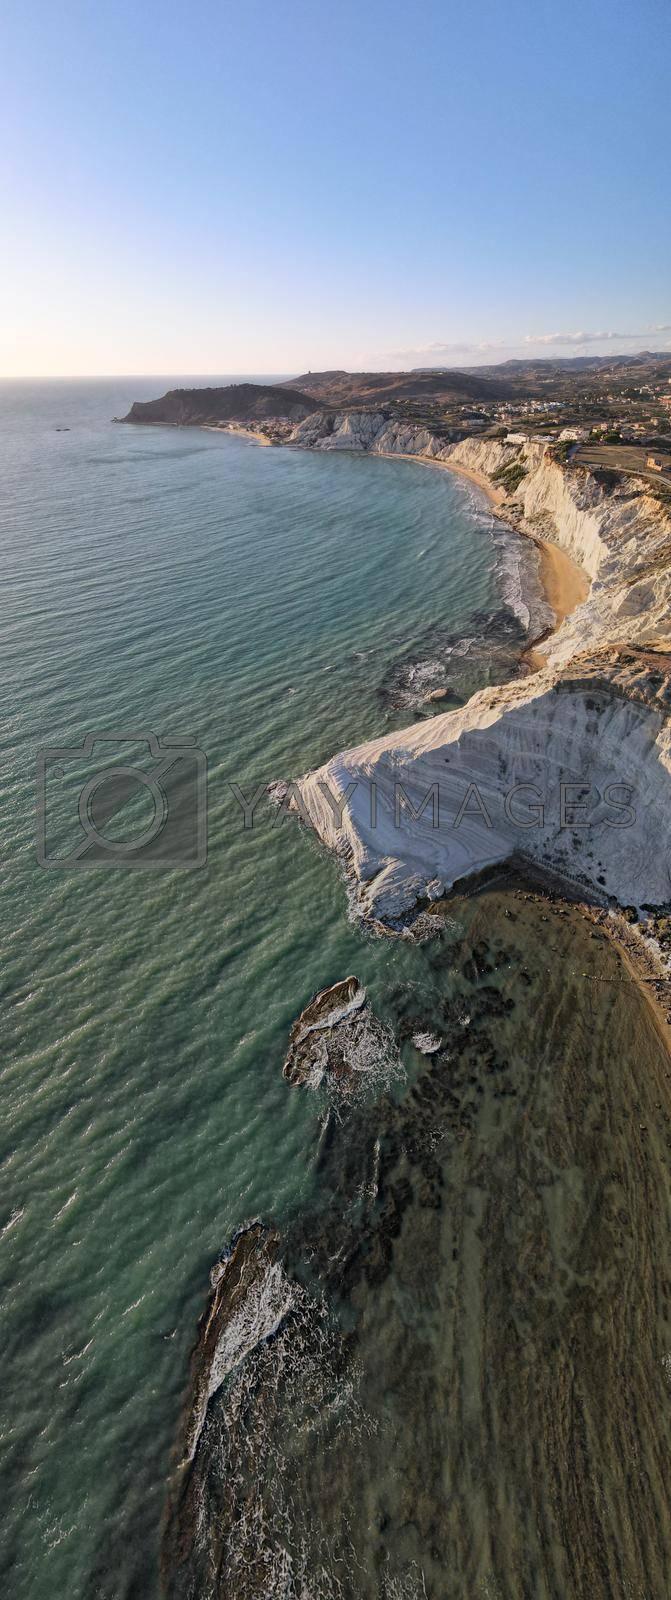 Sicilia Scala dei Turchi Stair of the Turks white coastline, Sicily Italy